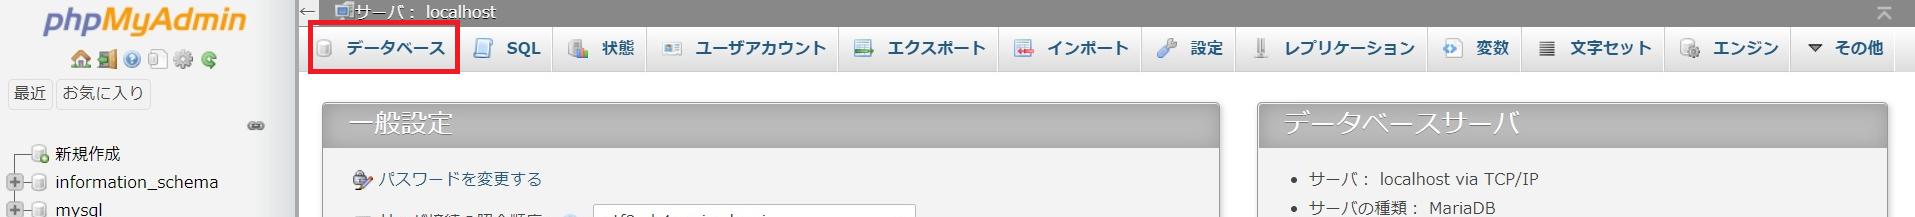 phpMyAdminでデータベースを選択